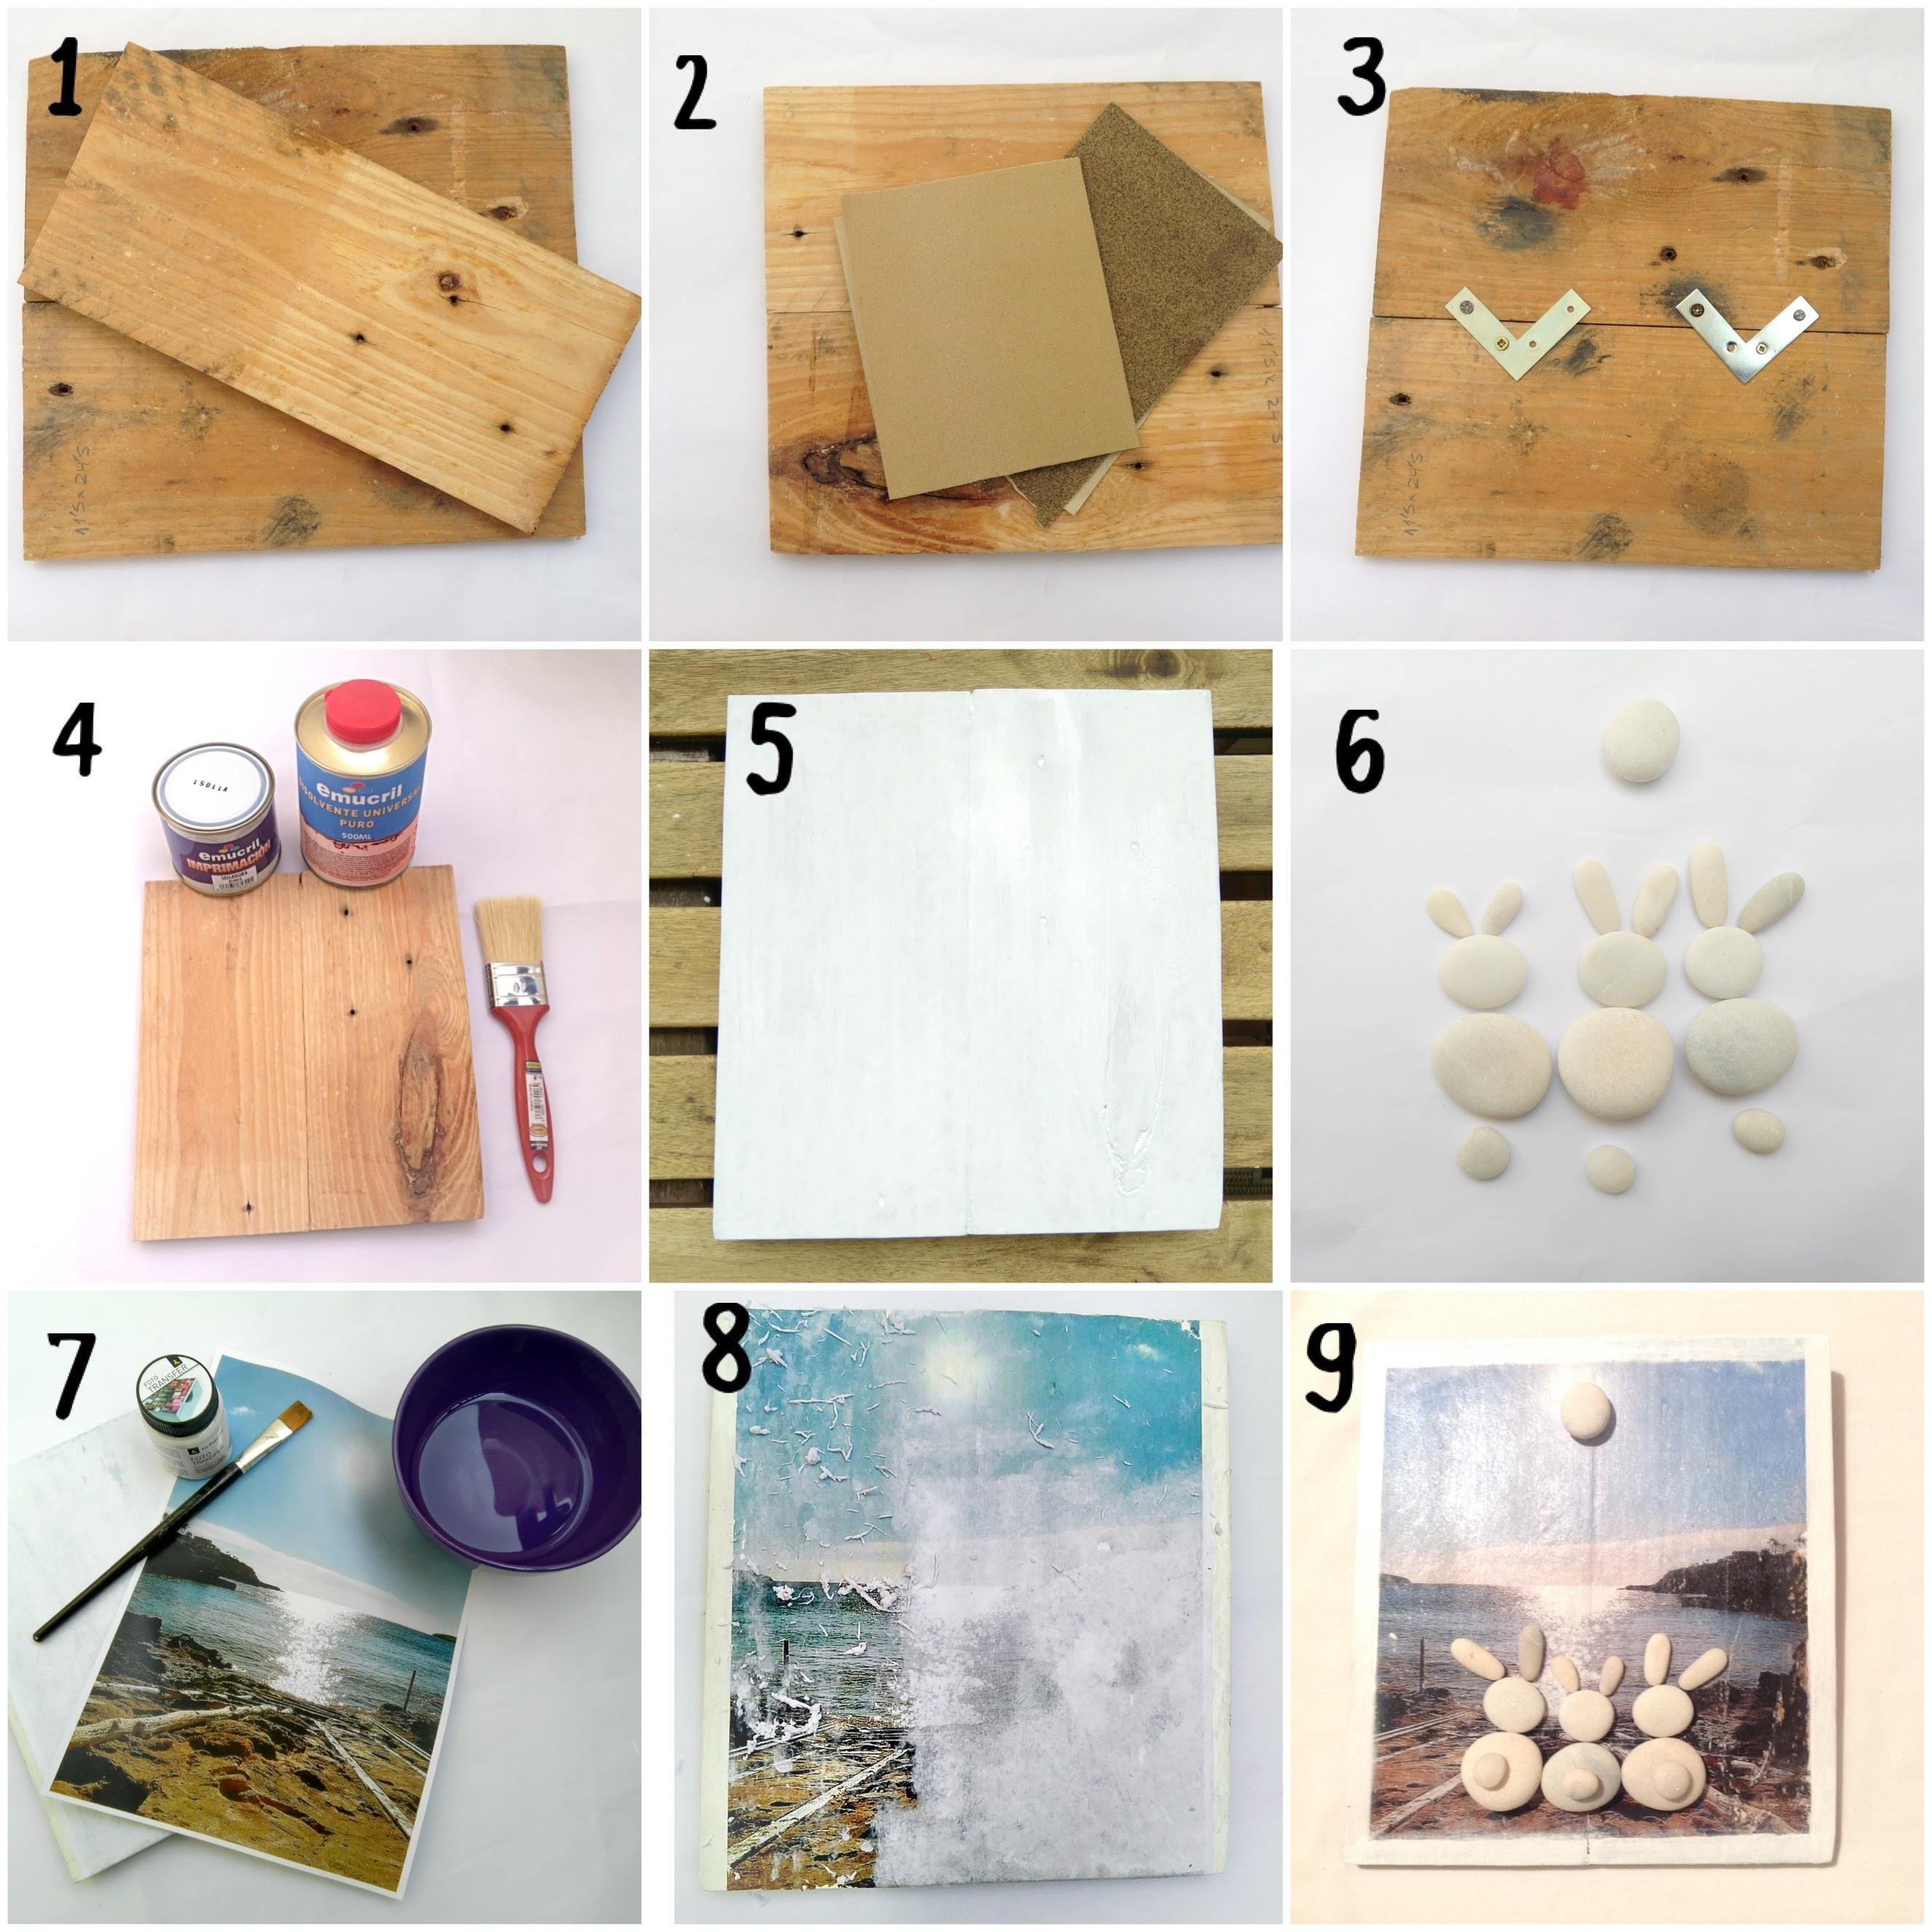 Como transferir imagenes a madera diy y manualidades en - Madera para manualidades ...